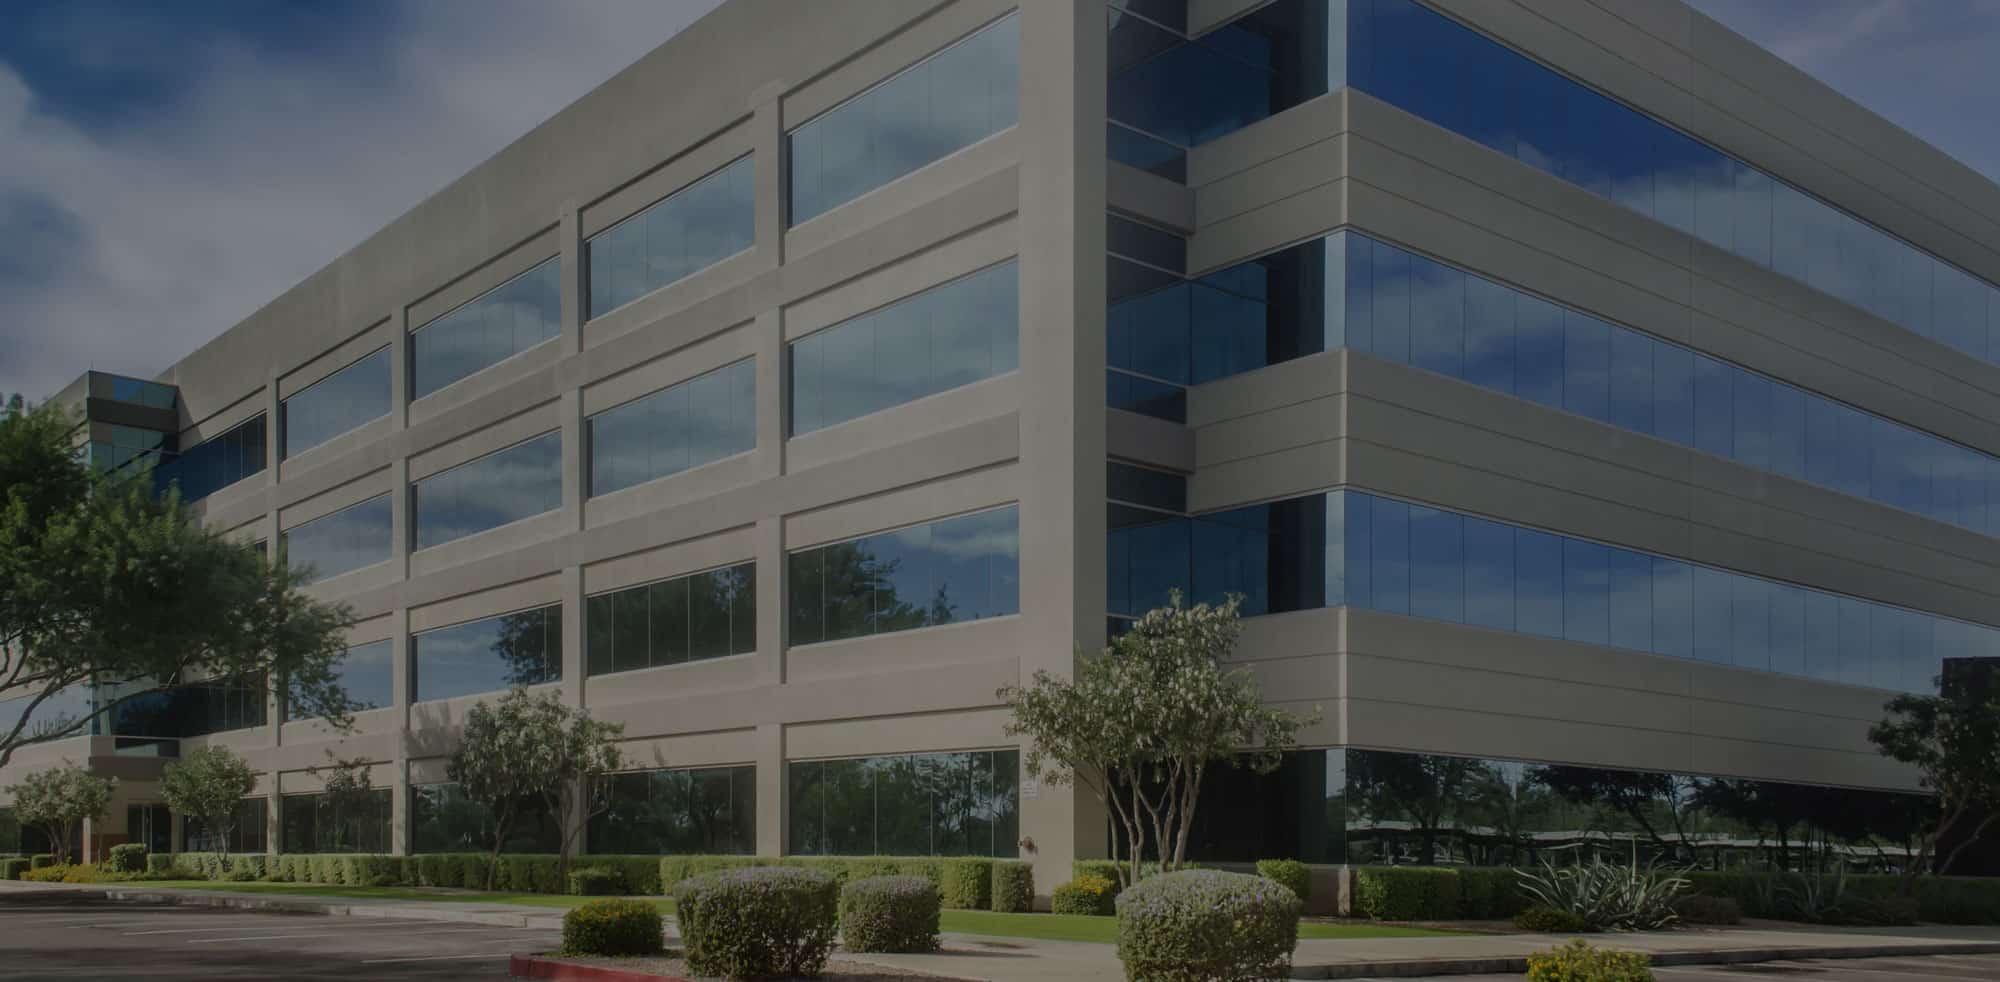 Exterior of a 4 story, big modern building and gardens